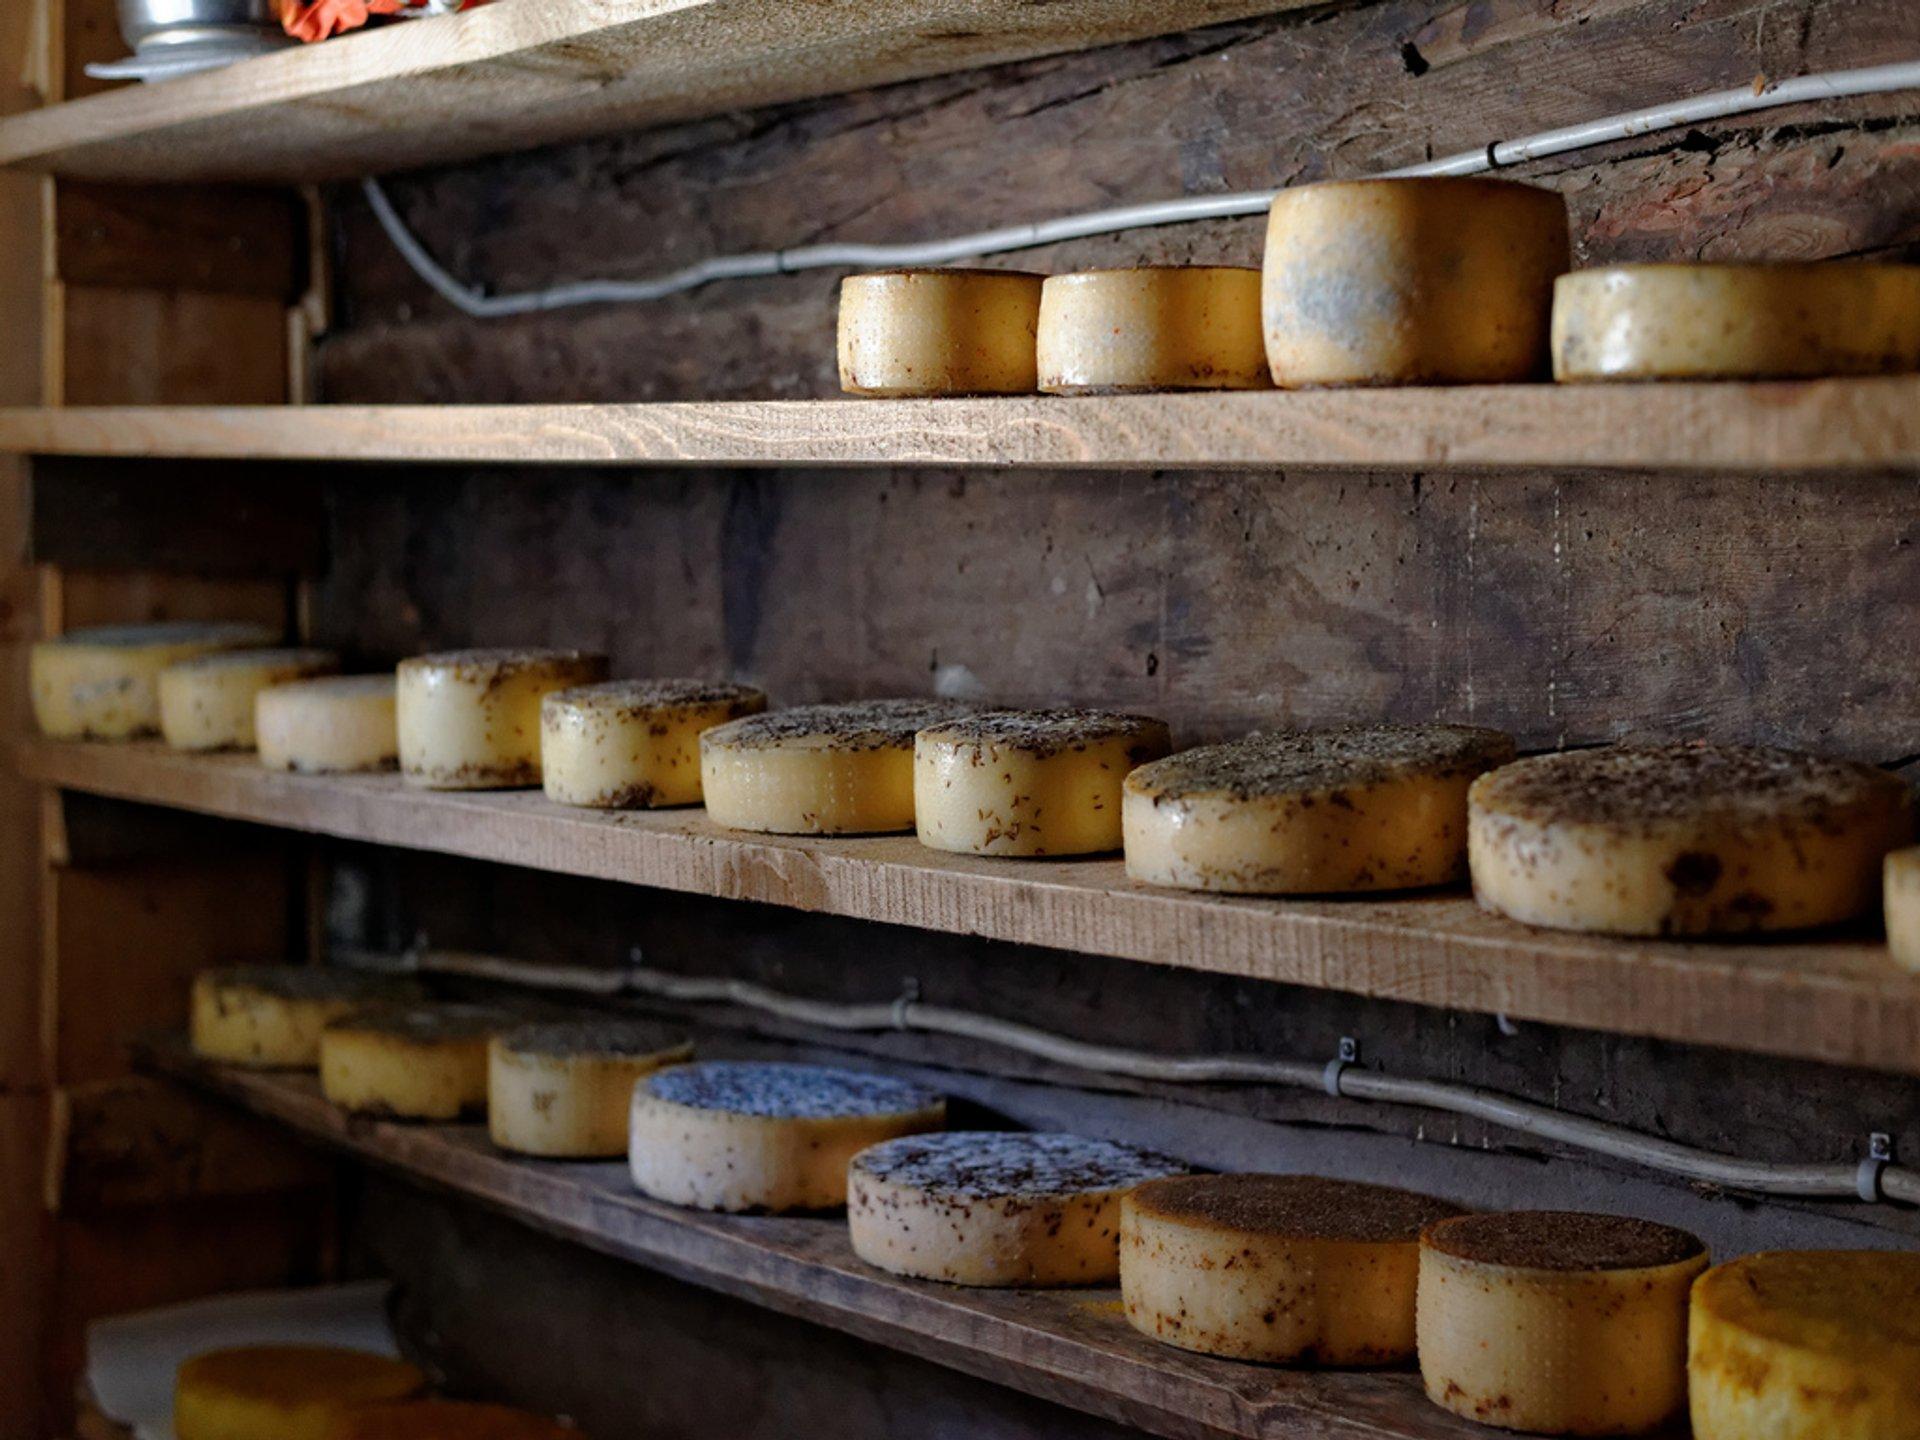 Cheese in Switzerland 2020 - Best Time